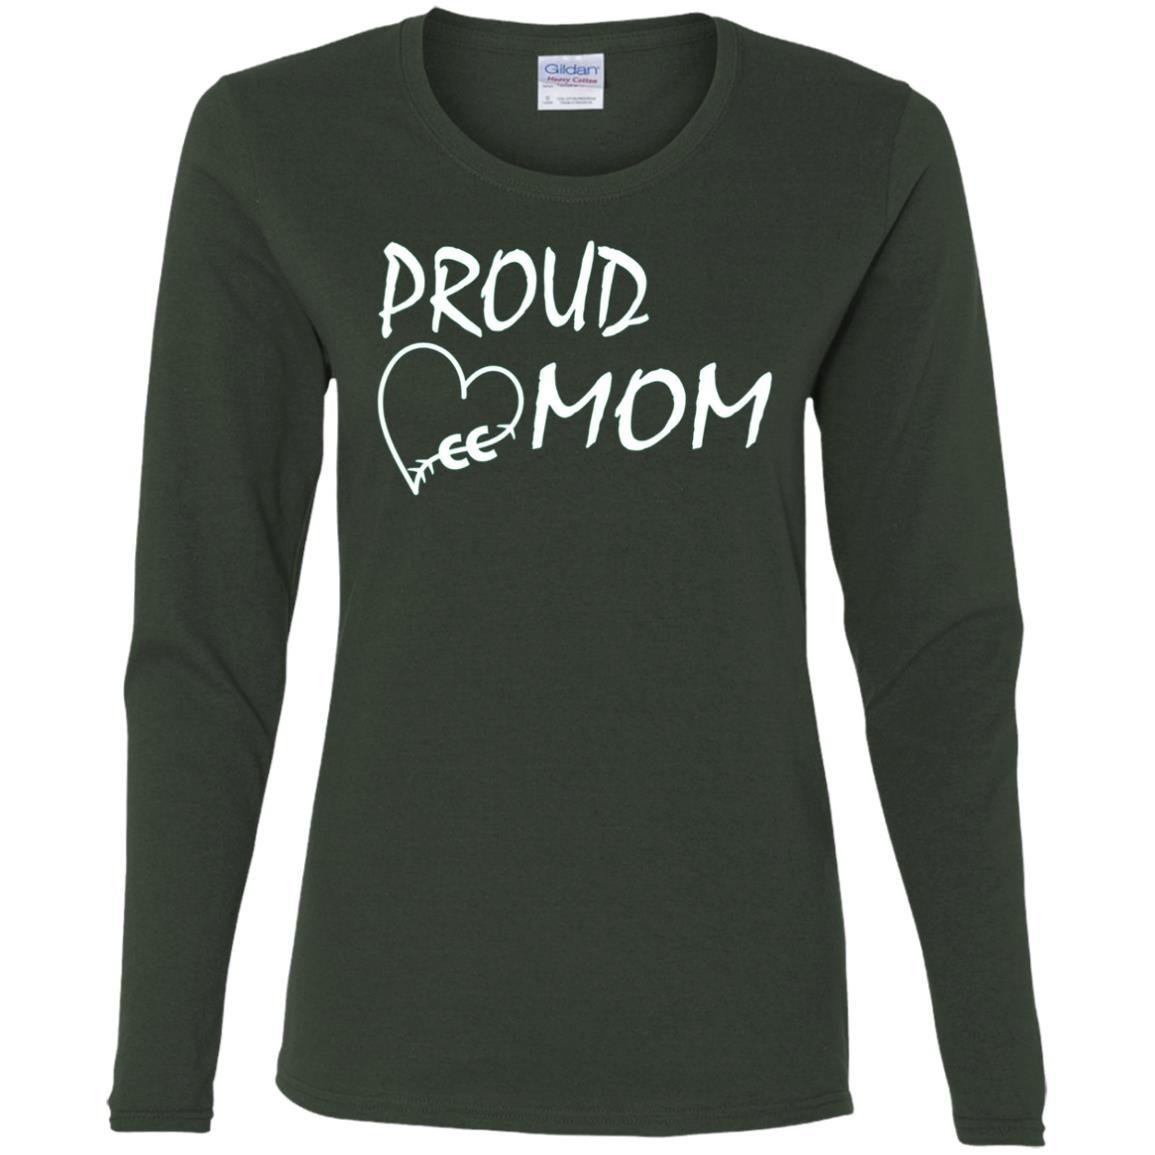 Long Distance Runner Proud Mom Cross the Country Women Long Sleeve T-Shirt